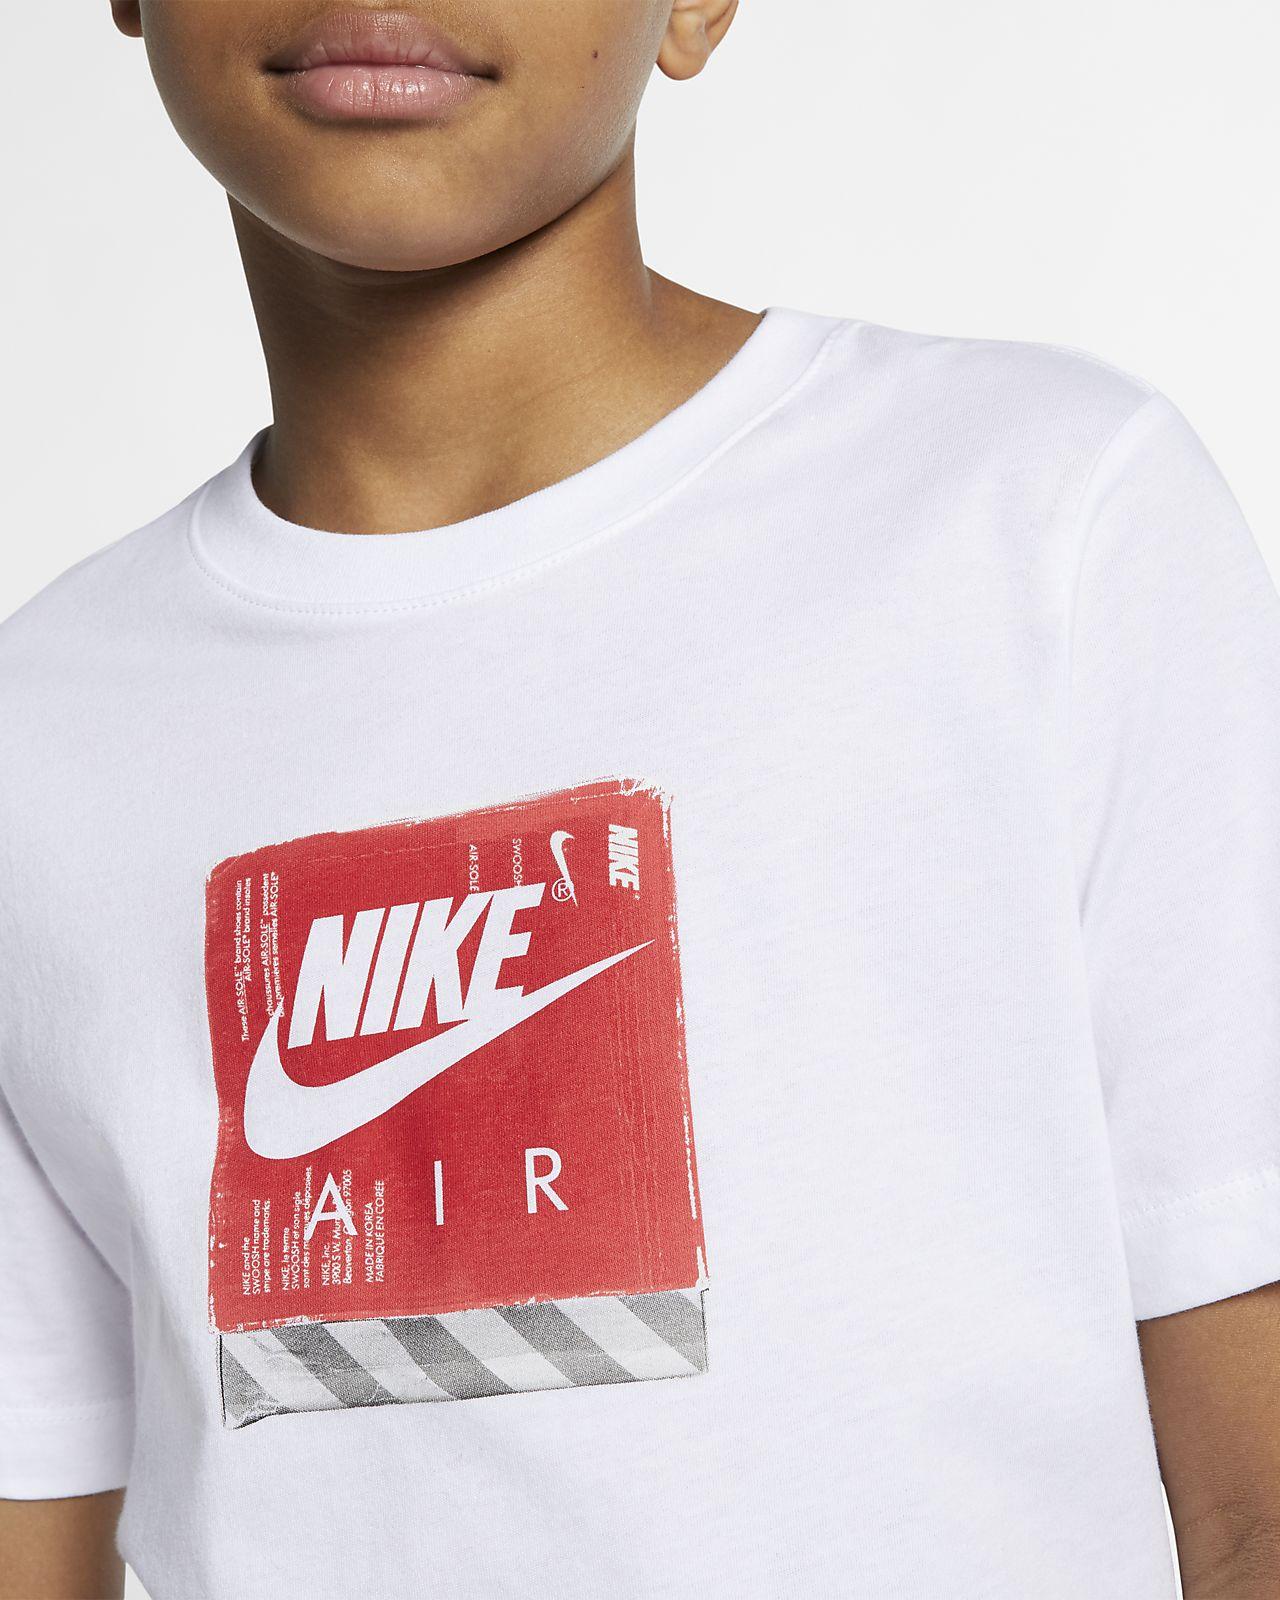 93ae205eb3 Low Resolution Nike Sportswear póló nagyobb gyerekeknek Nike Sportswear póló  nagyobb gyerekeknek